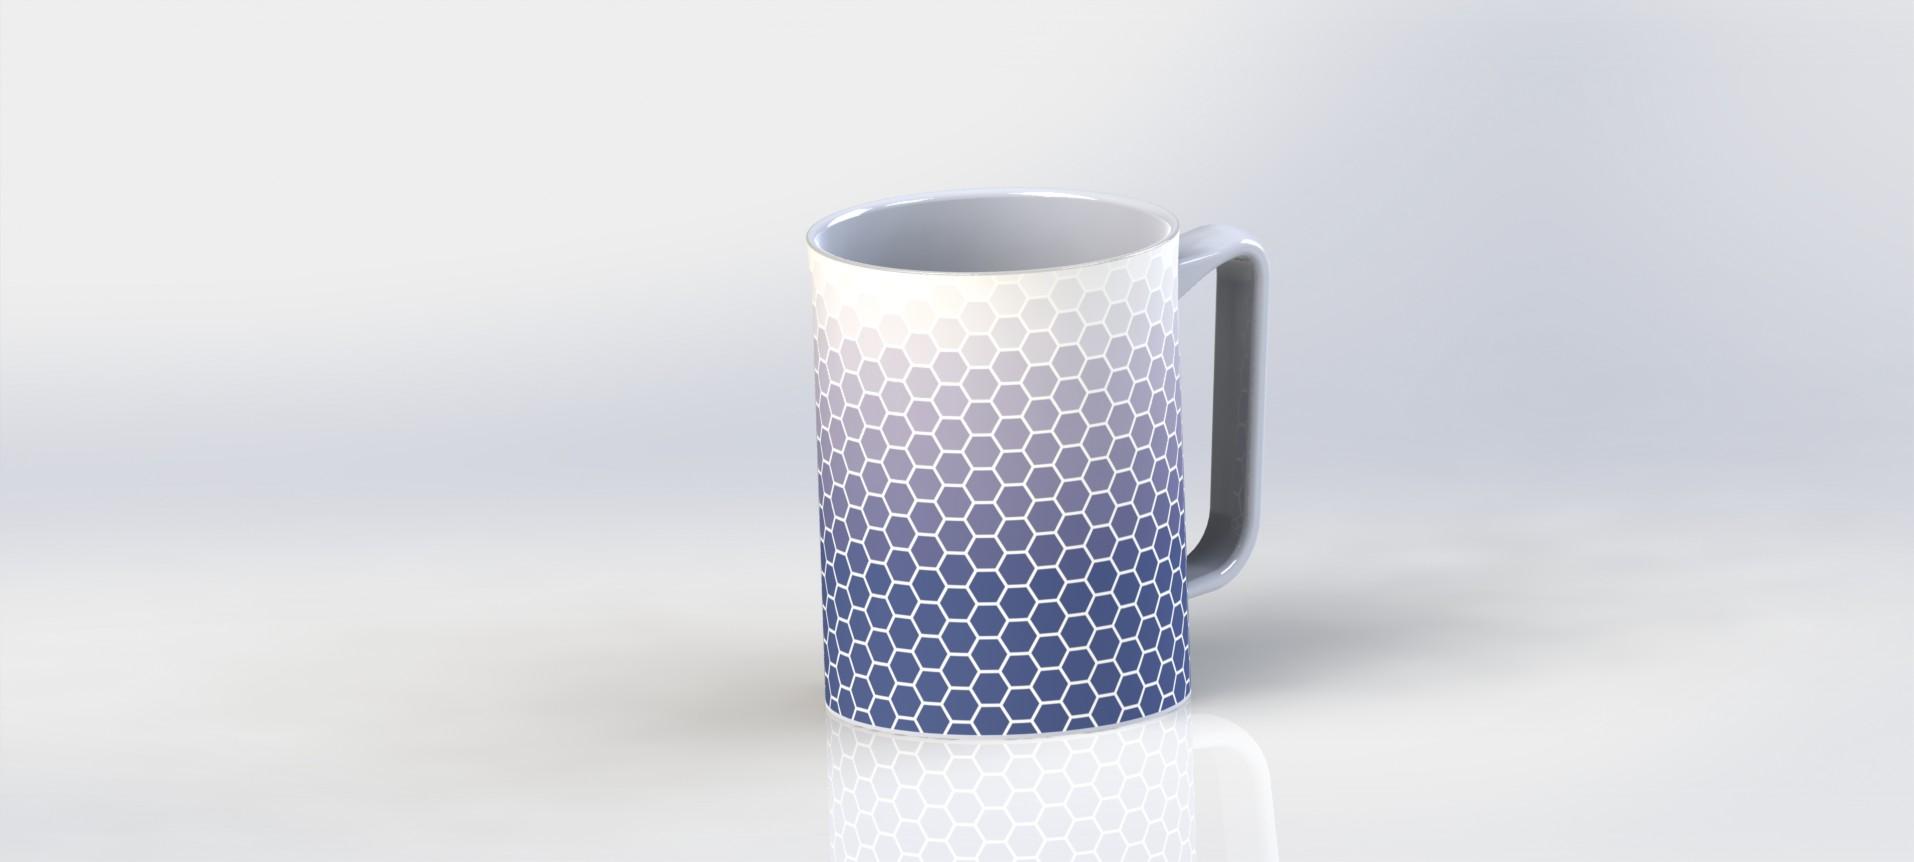 glowstone-heated-smart-mug-fine-bone-china-hexagonal-decoration-a